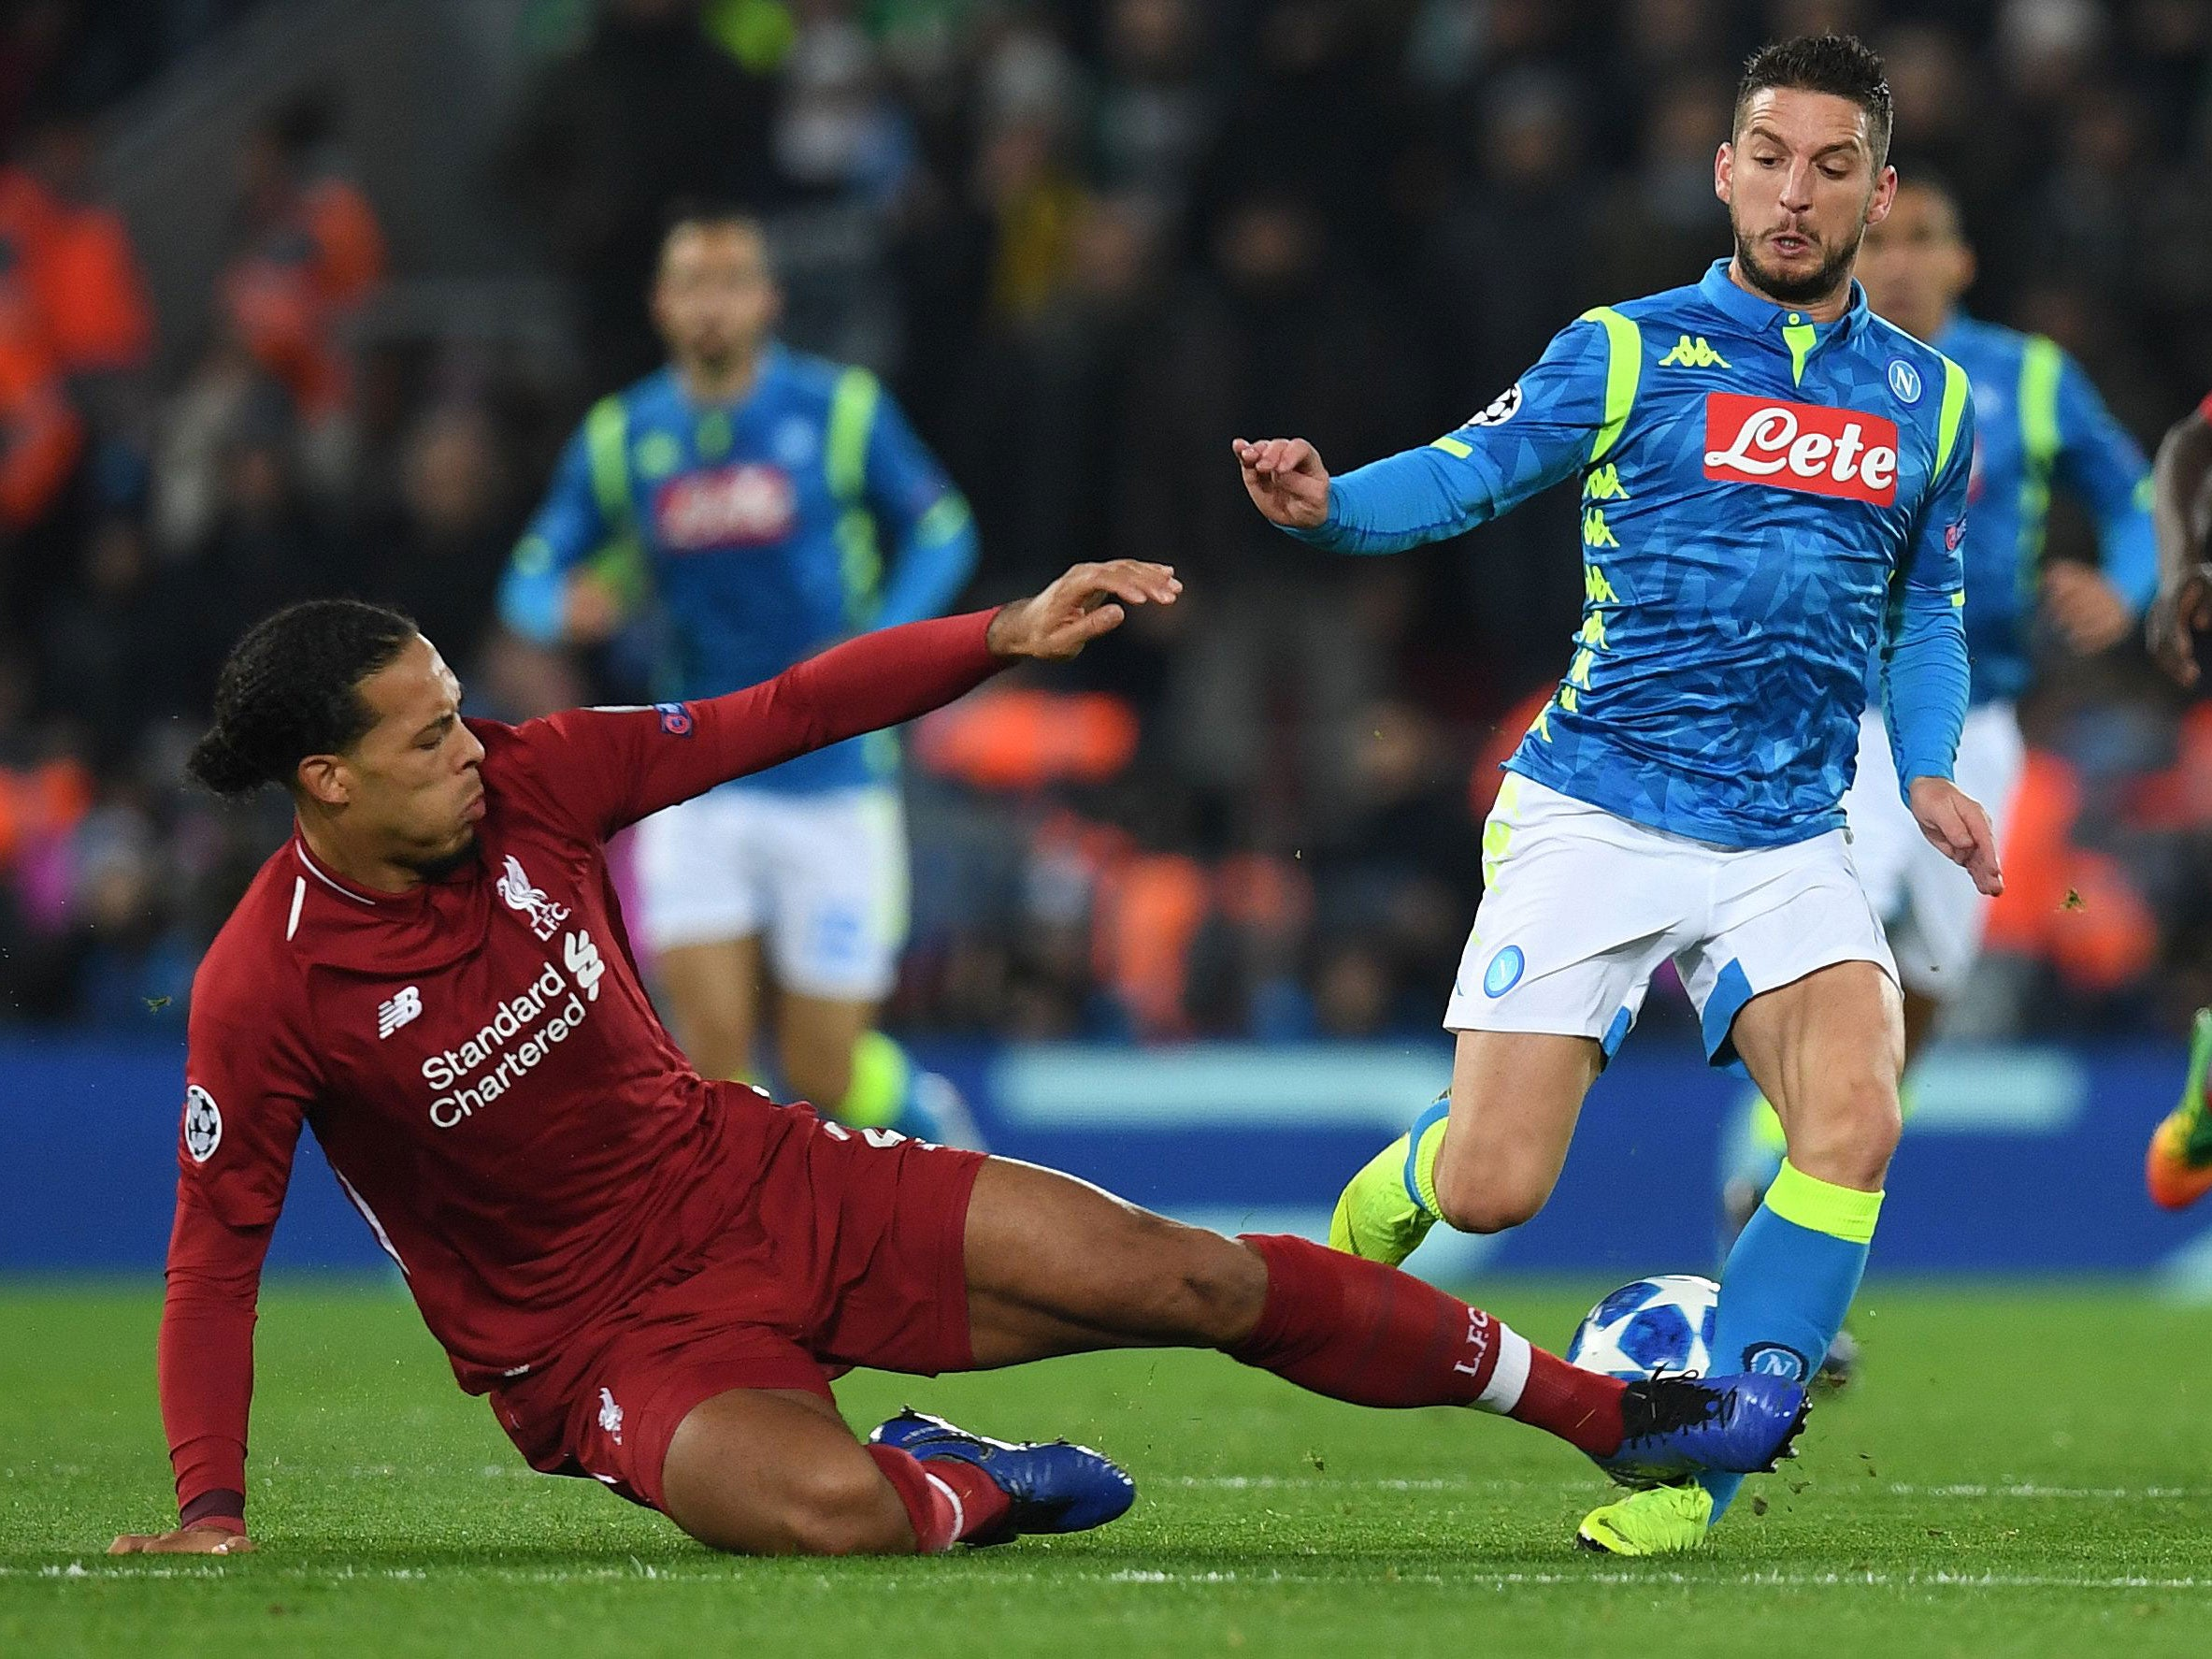 Liverpool Vs Napoli Virgil Van Dijk Defends Himself On